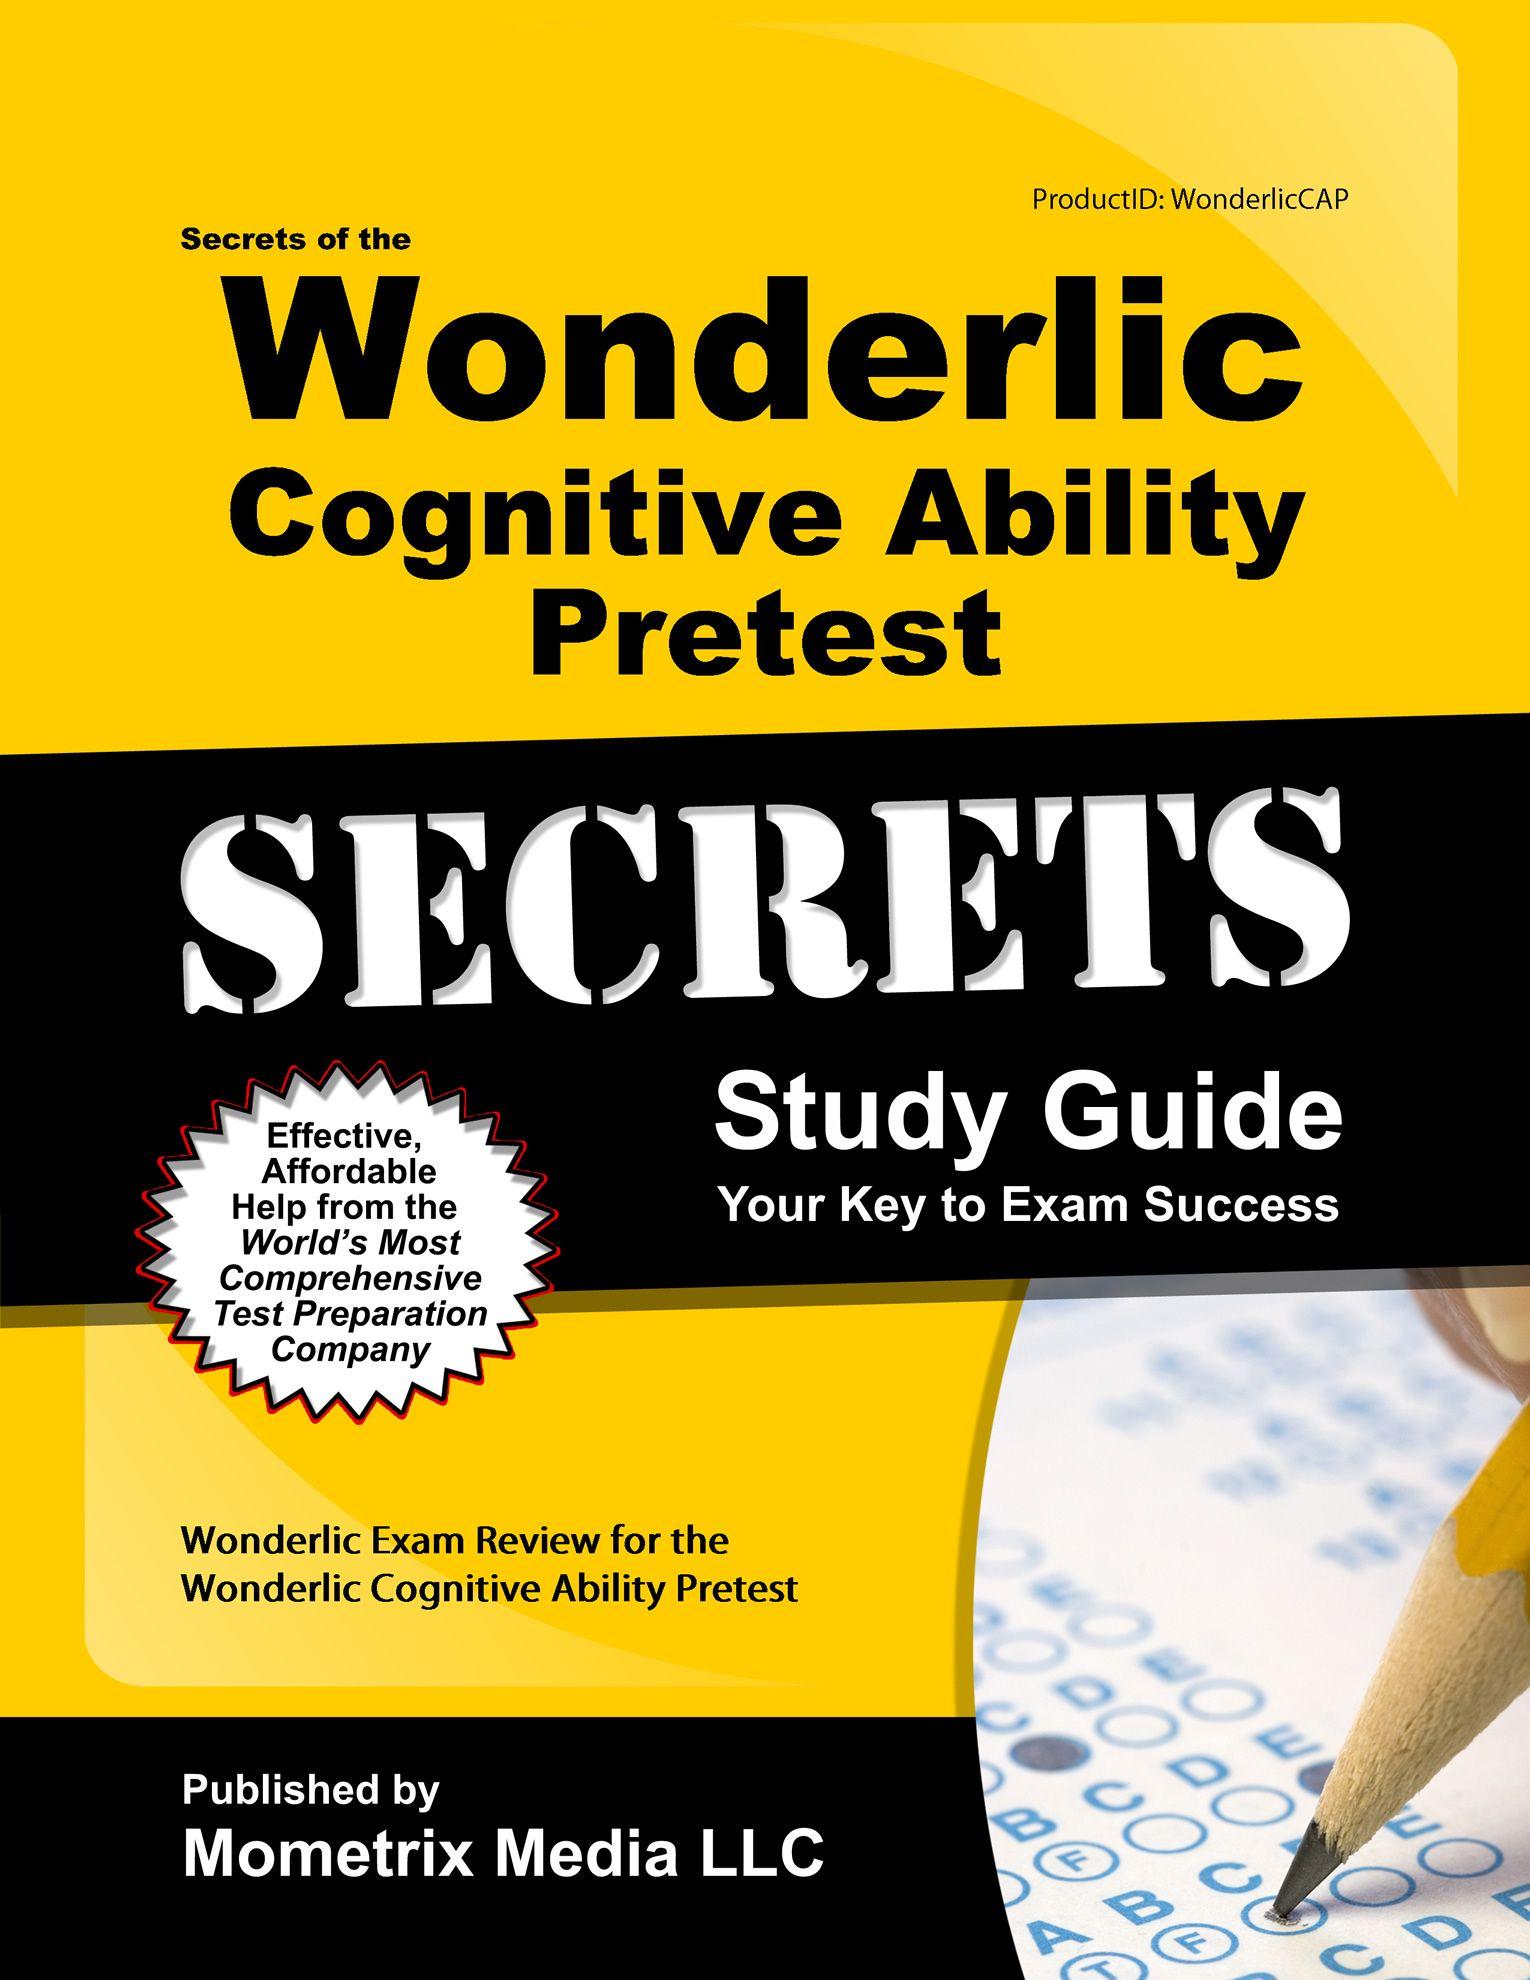 Pin on Wonderlic Test Study Guide